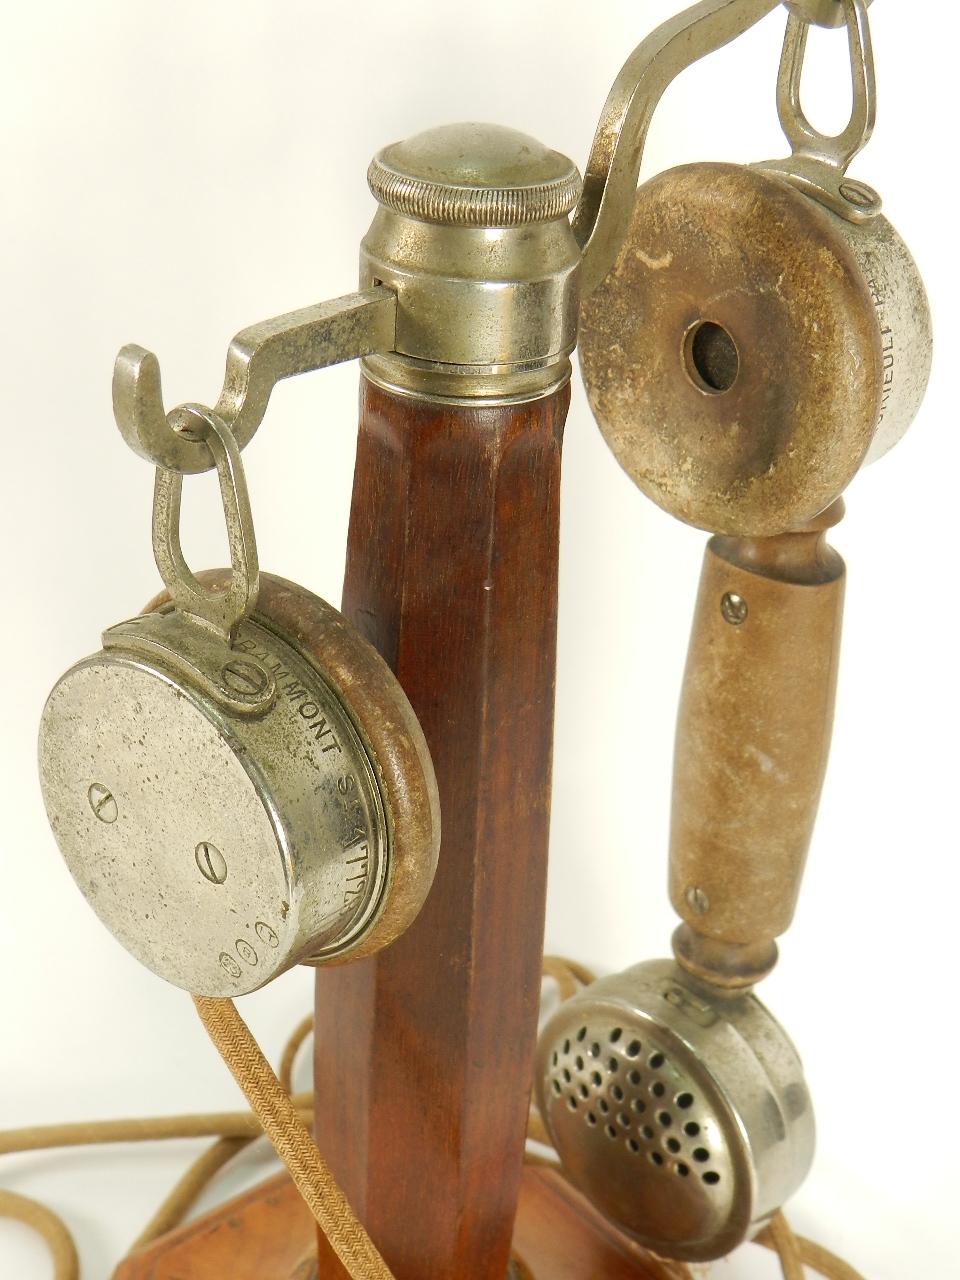 Imagen TELÉFONO DE COLUMNA GRAMMONT AÑO 1920 27806